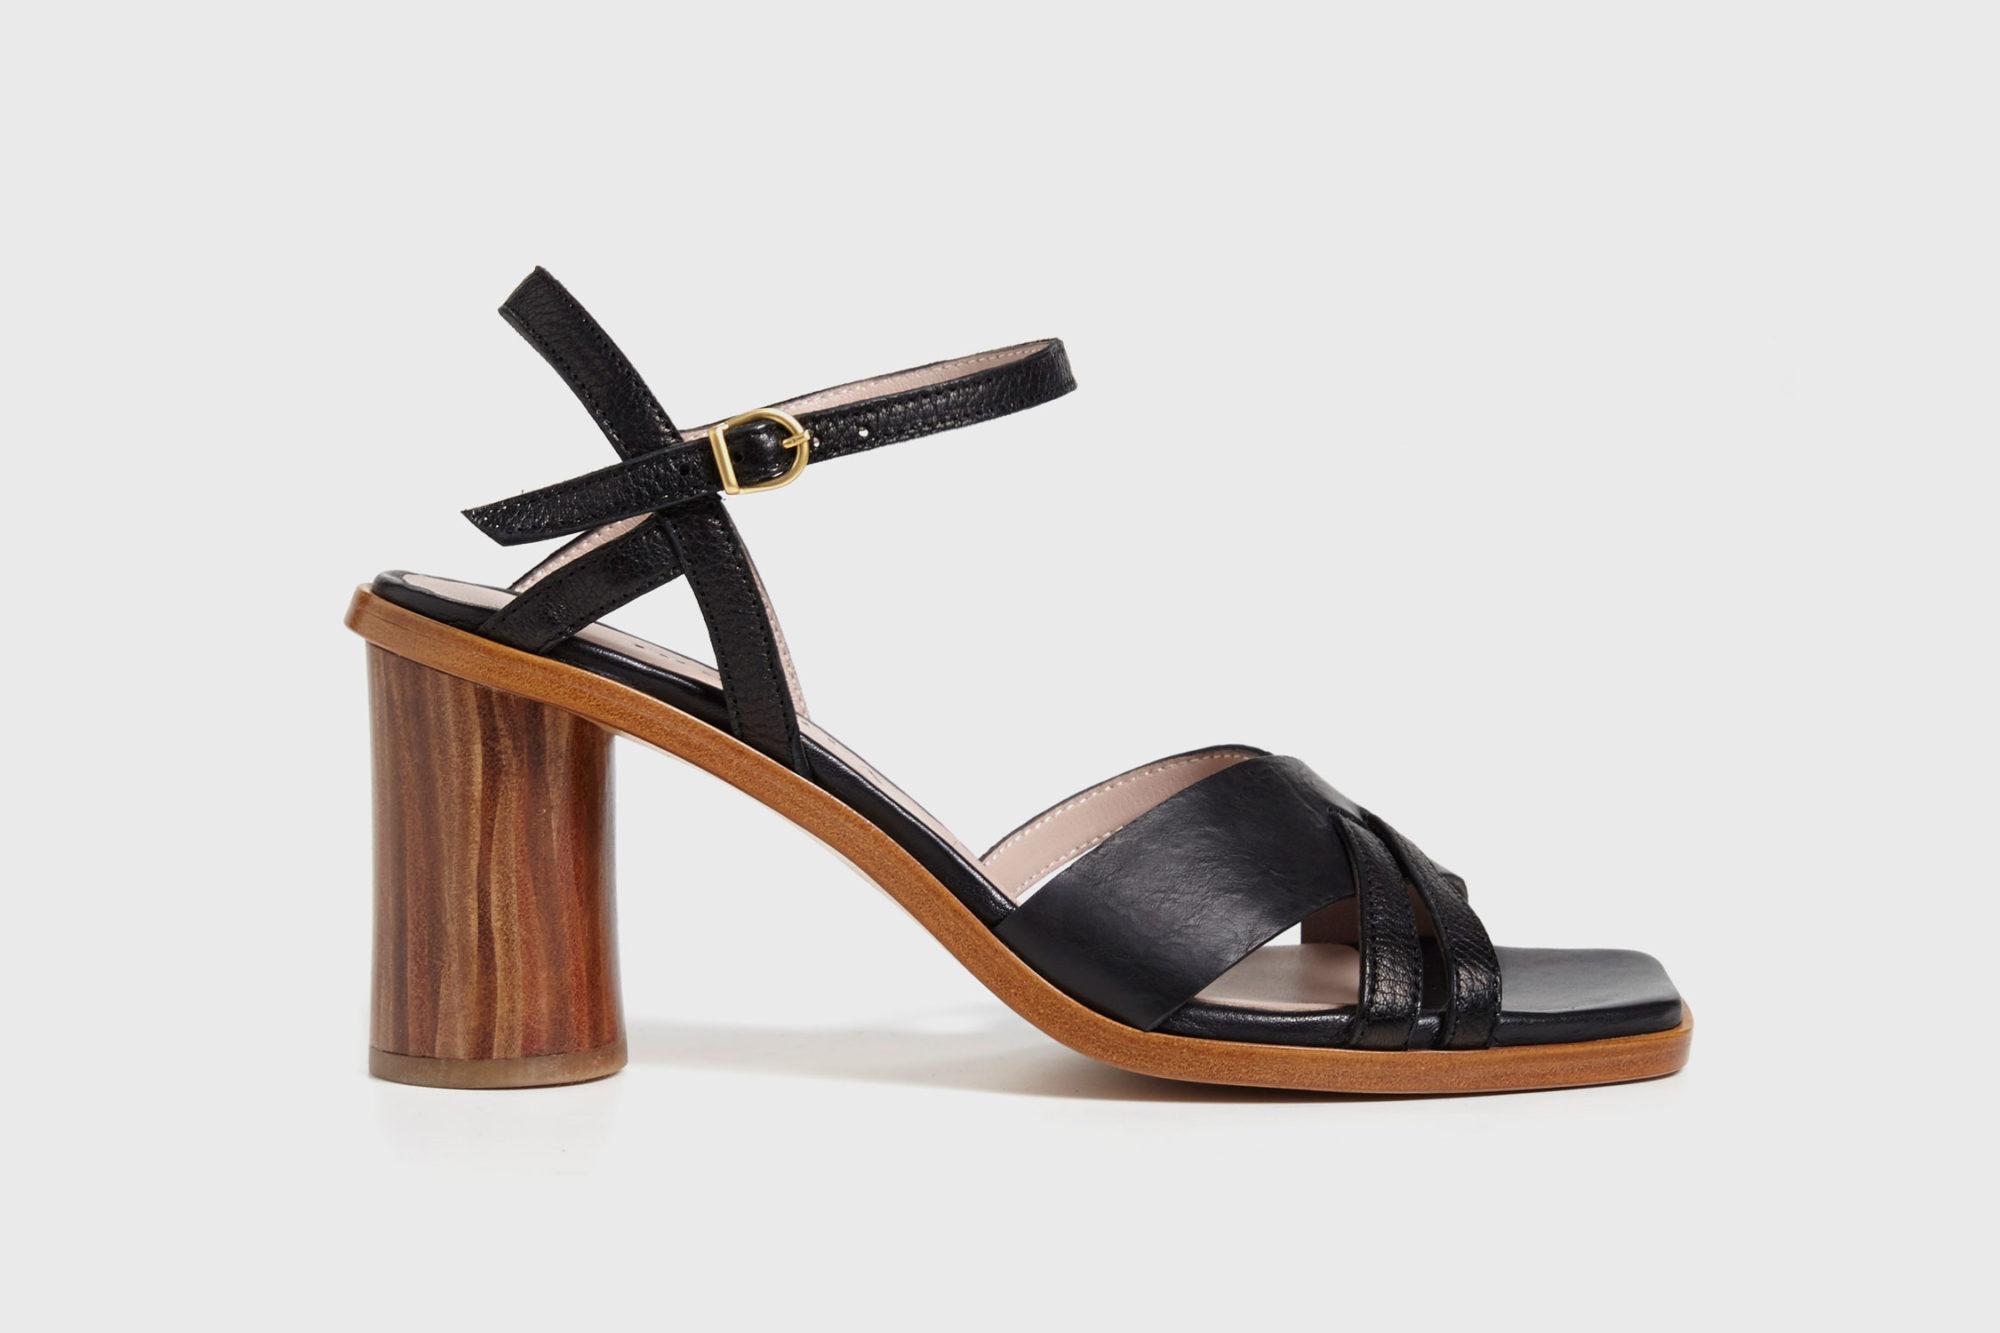 Dorotea sandalia de tacón alto Sophie ss17 perfil